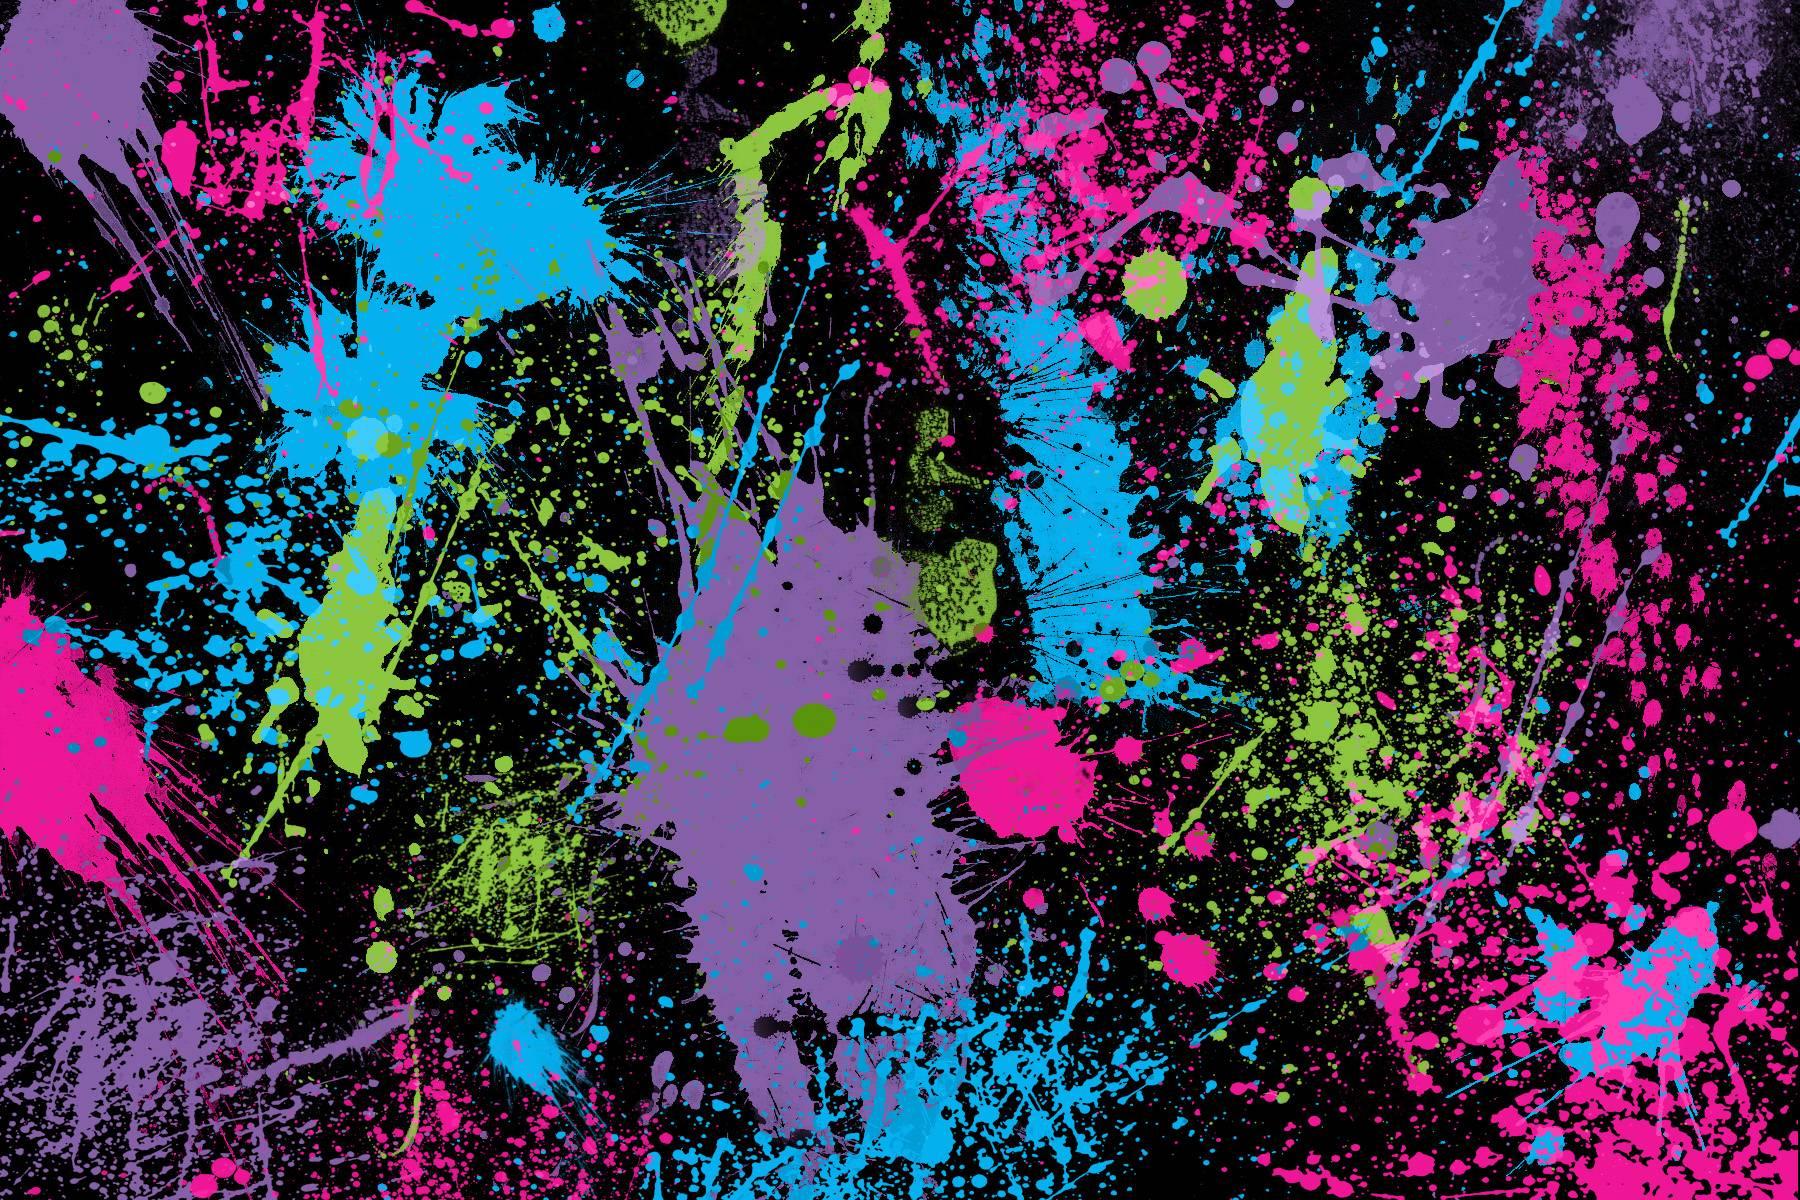 Glowing Neon Paint Splatter Backgrounds - Tera Wallpaper